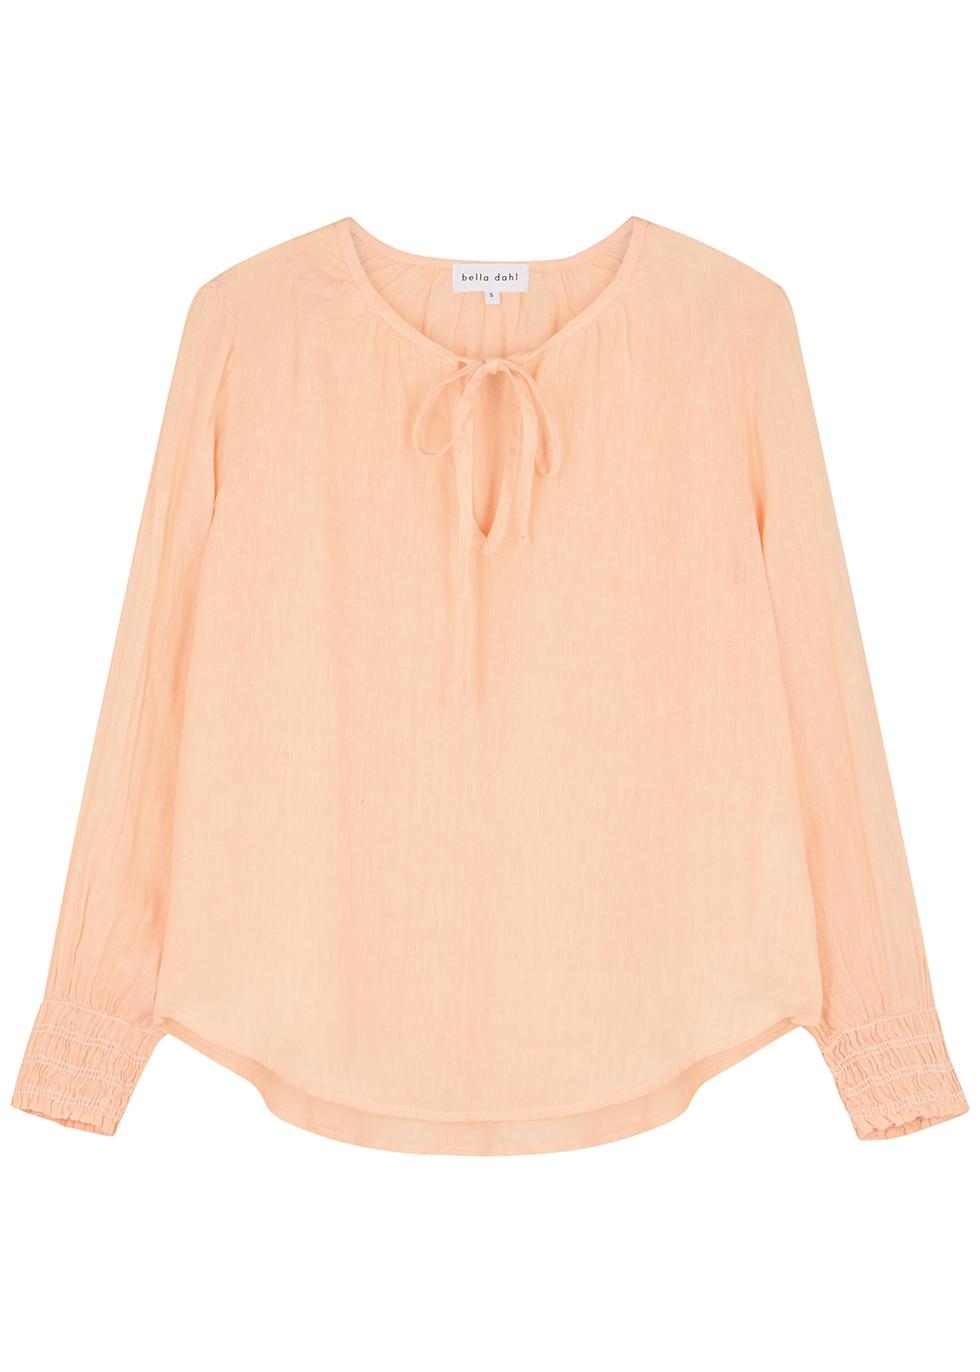 Peach linen blouse